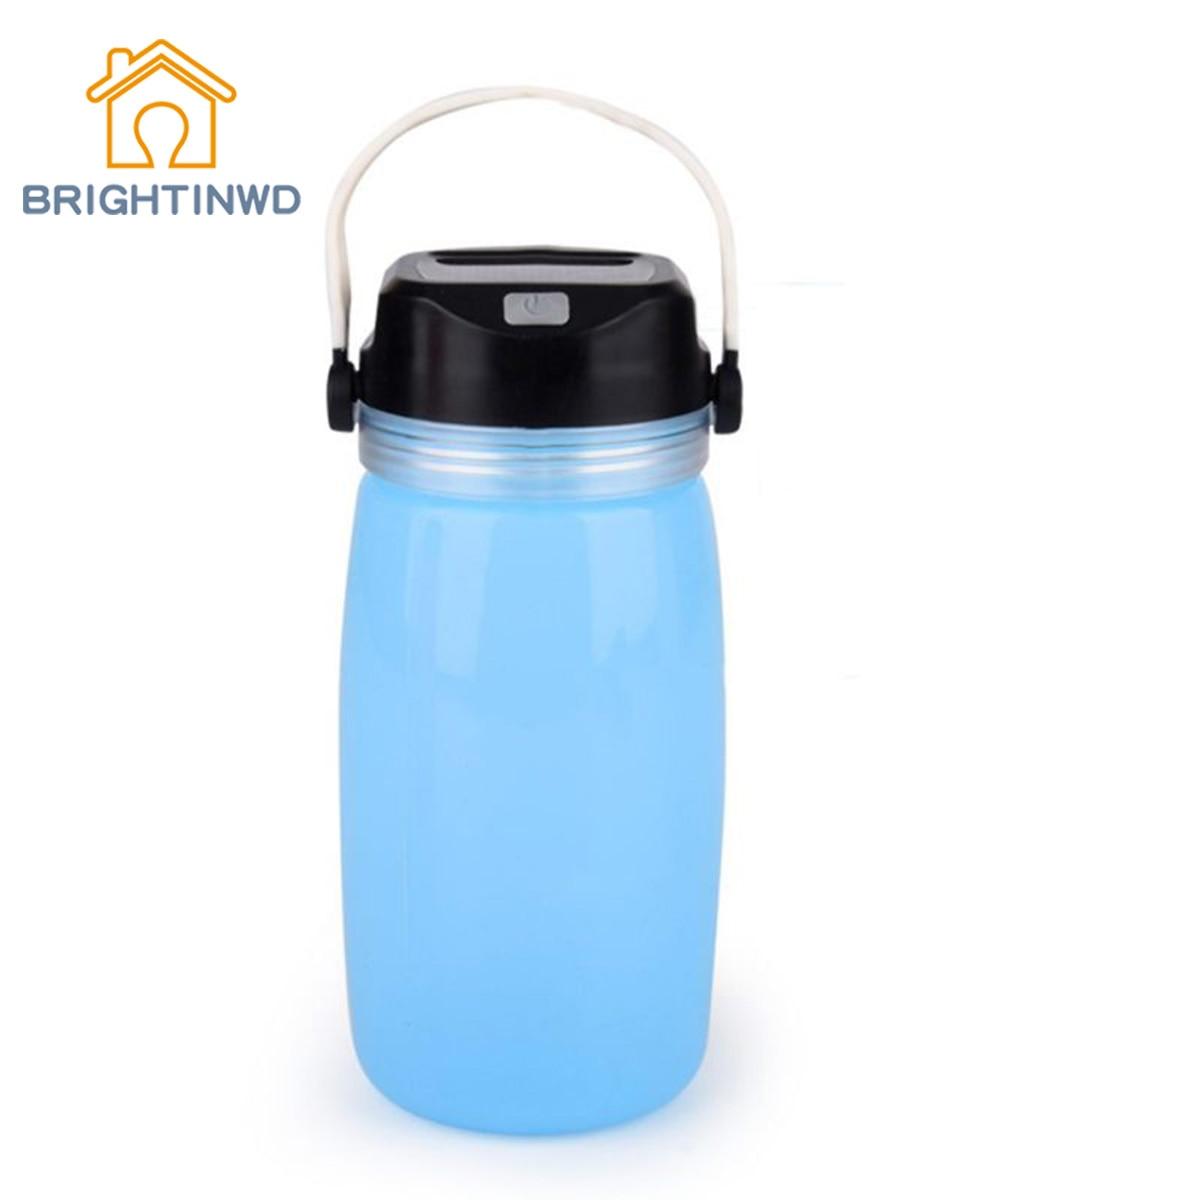 BRIGHTINWD Lantern Lights Gift Kid Outdoor LED linterna Portable Leak-Proof Sports Bottle Solar Charging Luminous Cup Tent Light